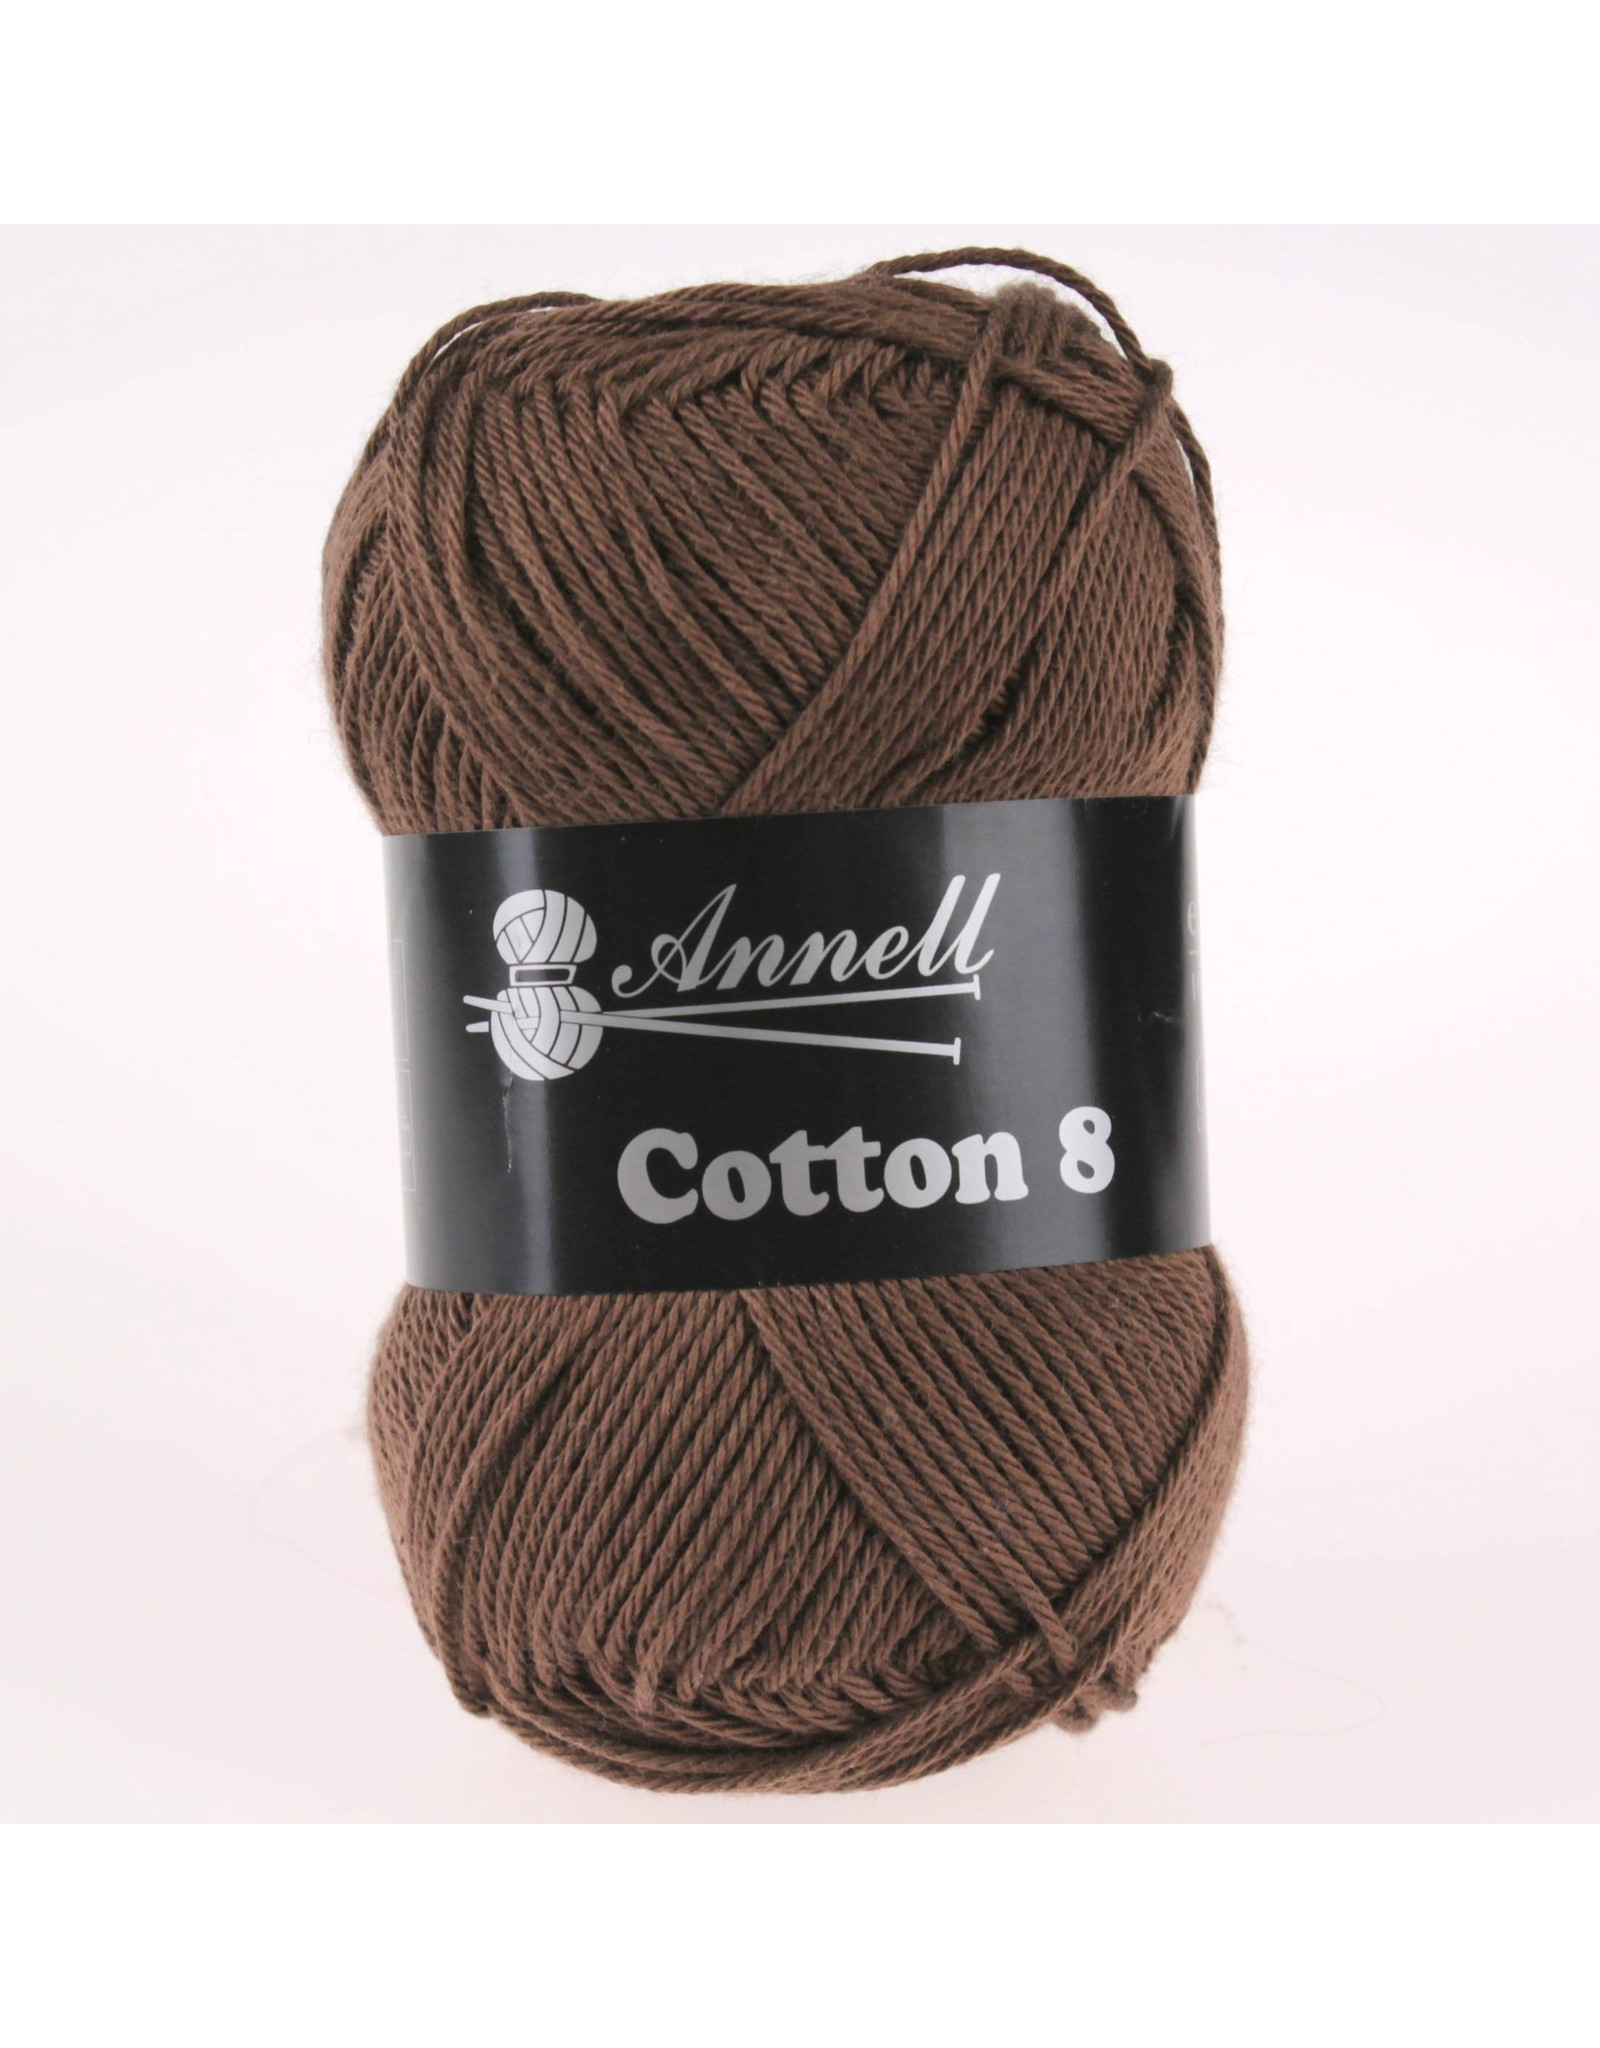 Annell Annell Cotton 8